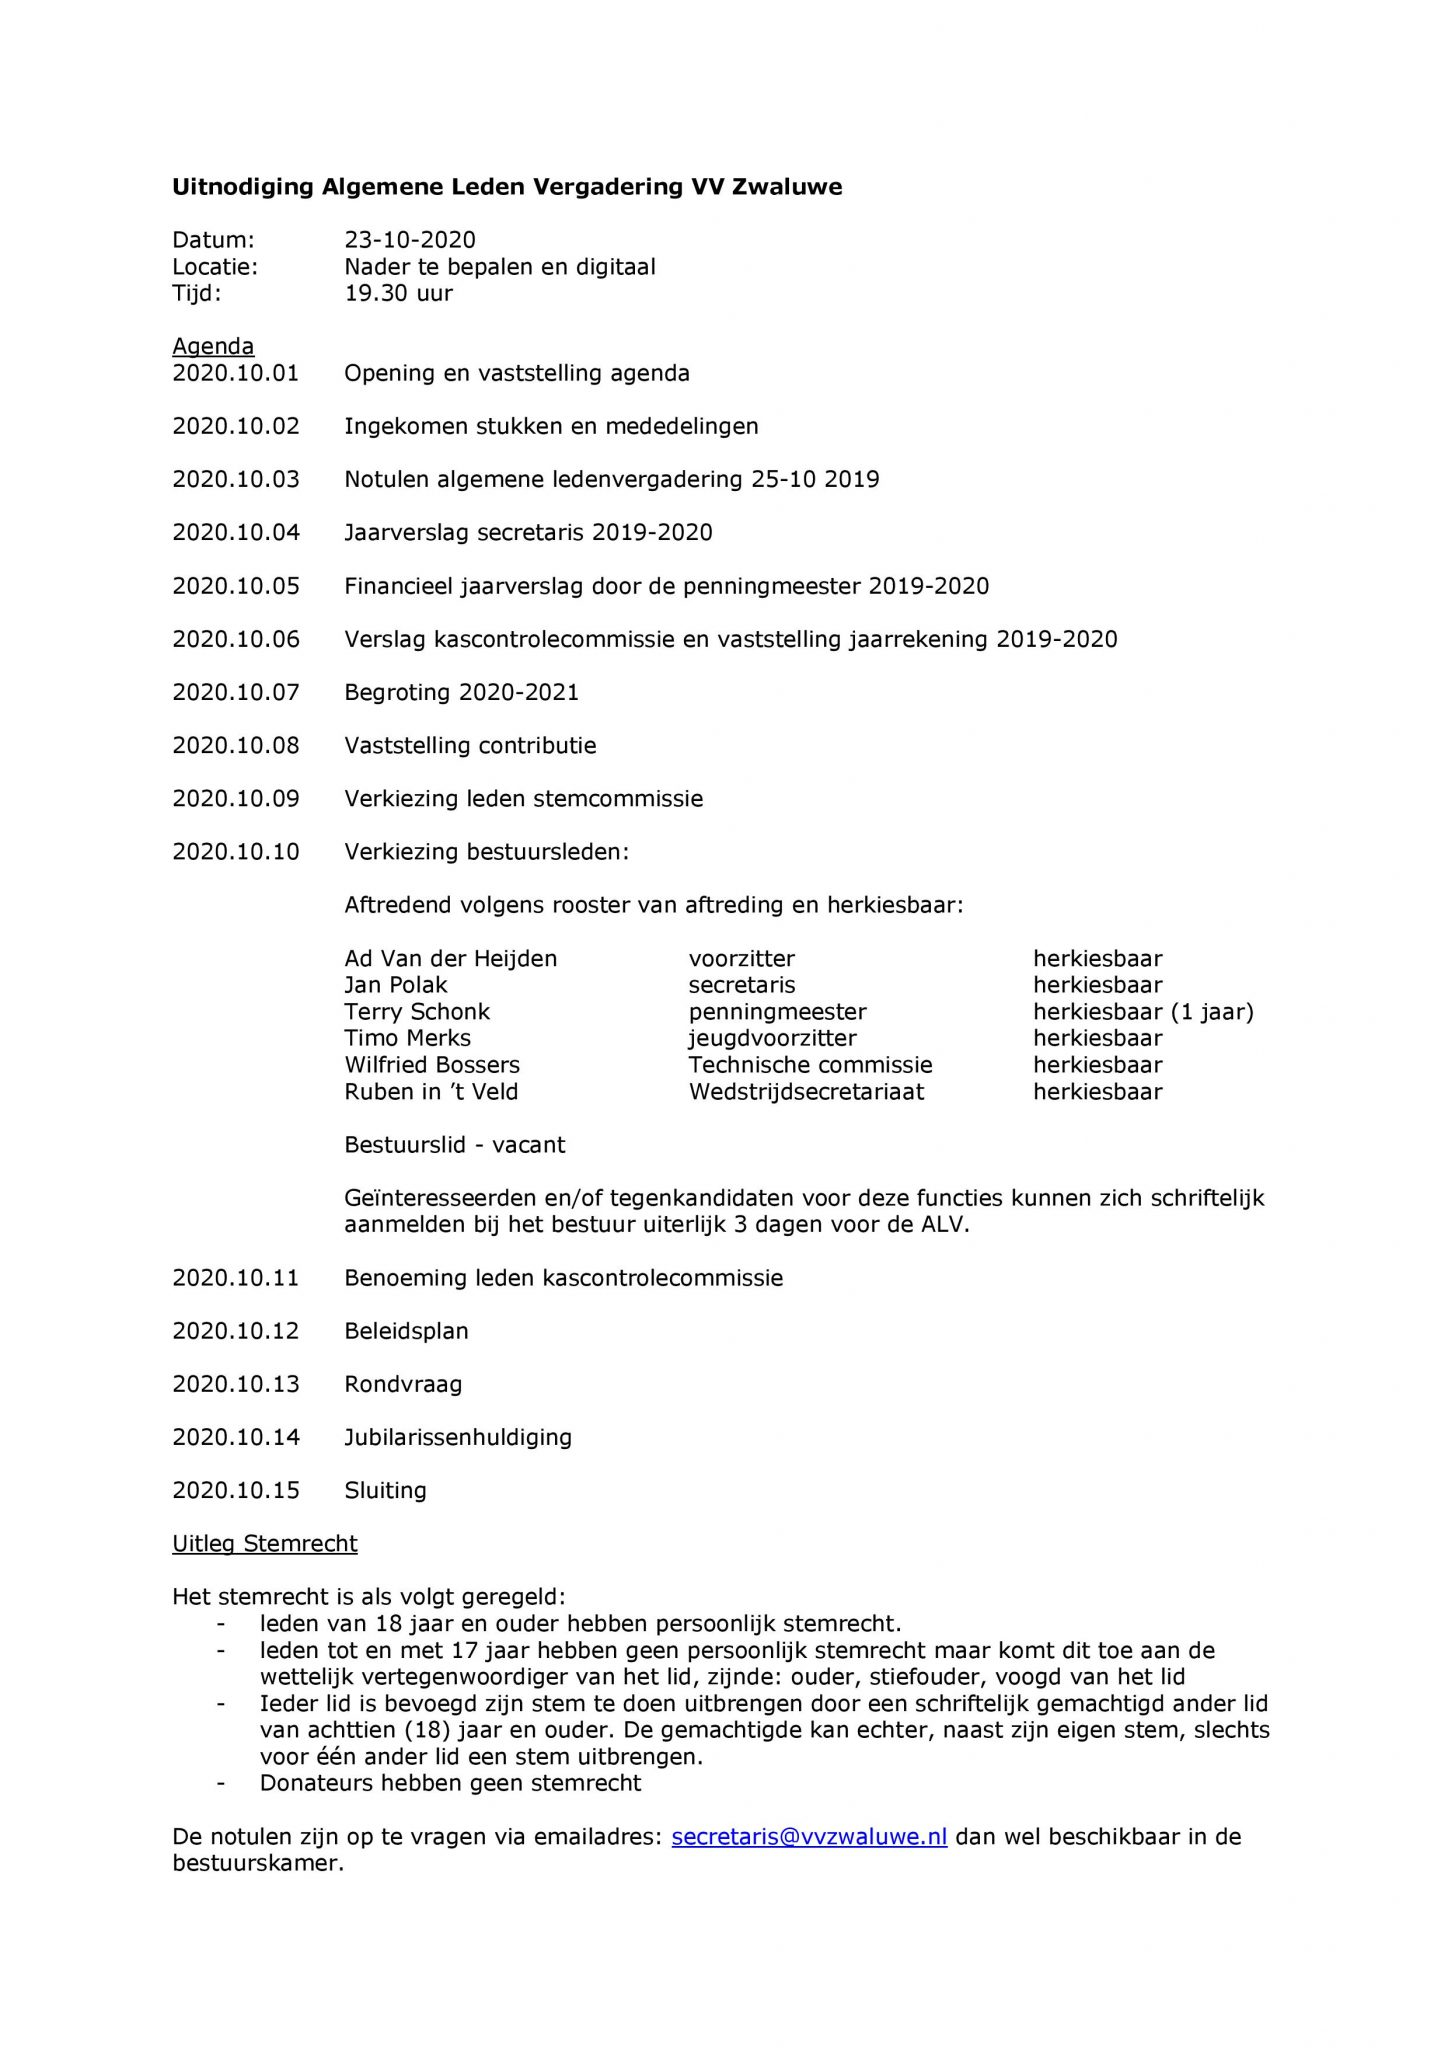 Algemene ledenvergadering (Aanmelden verplicht)